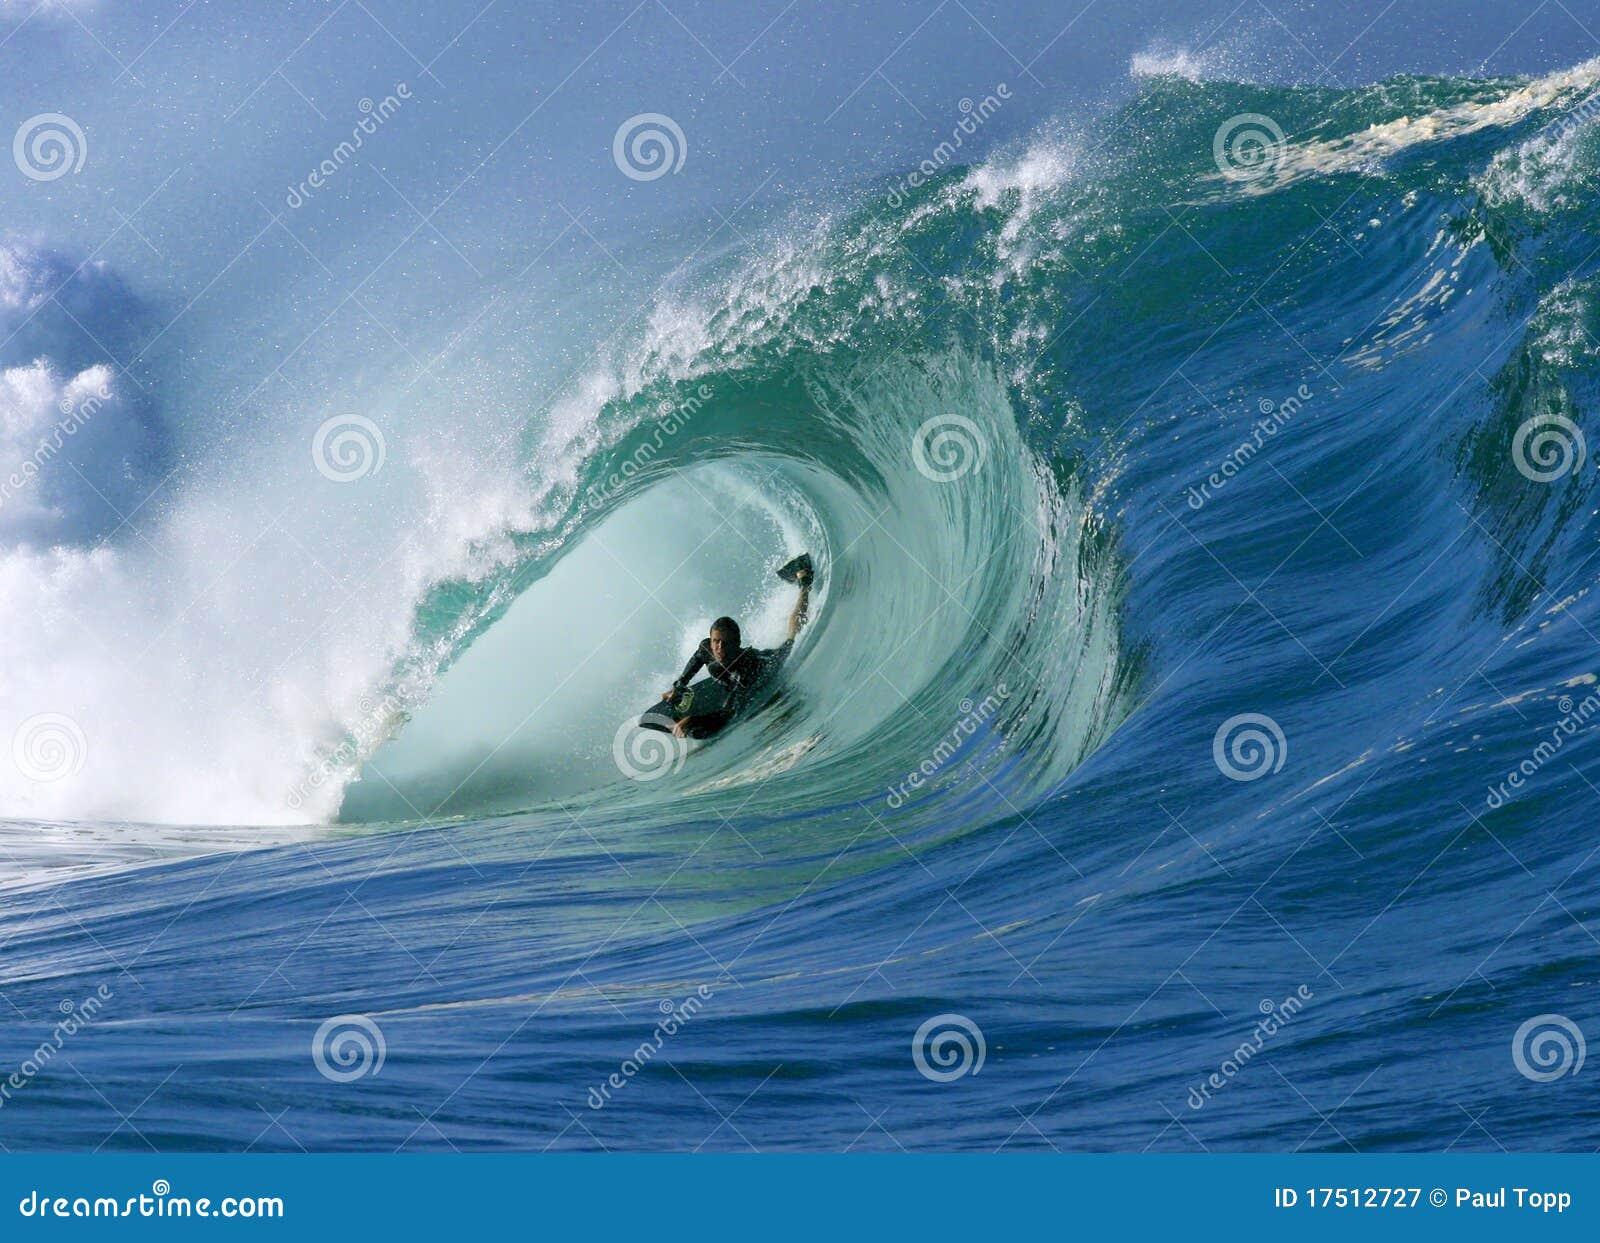 Surfing a Perfect Tube Wave at Waimea Bay Hawaii